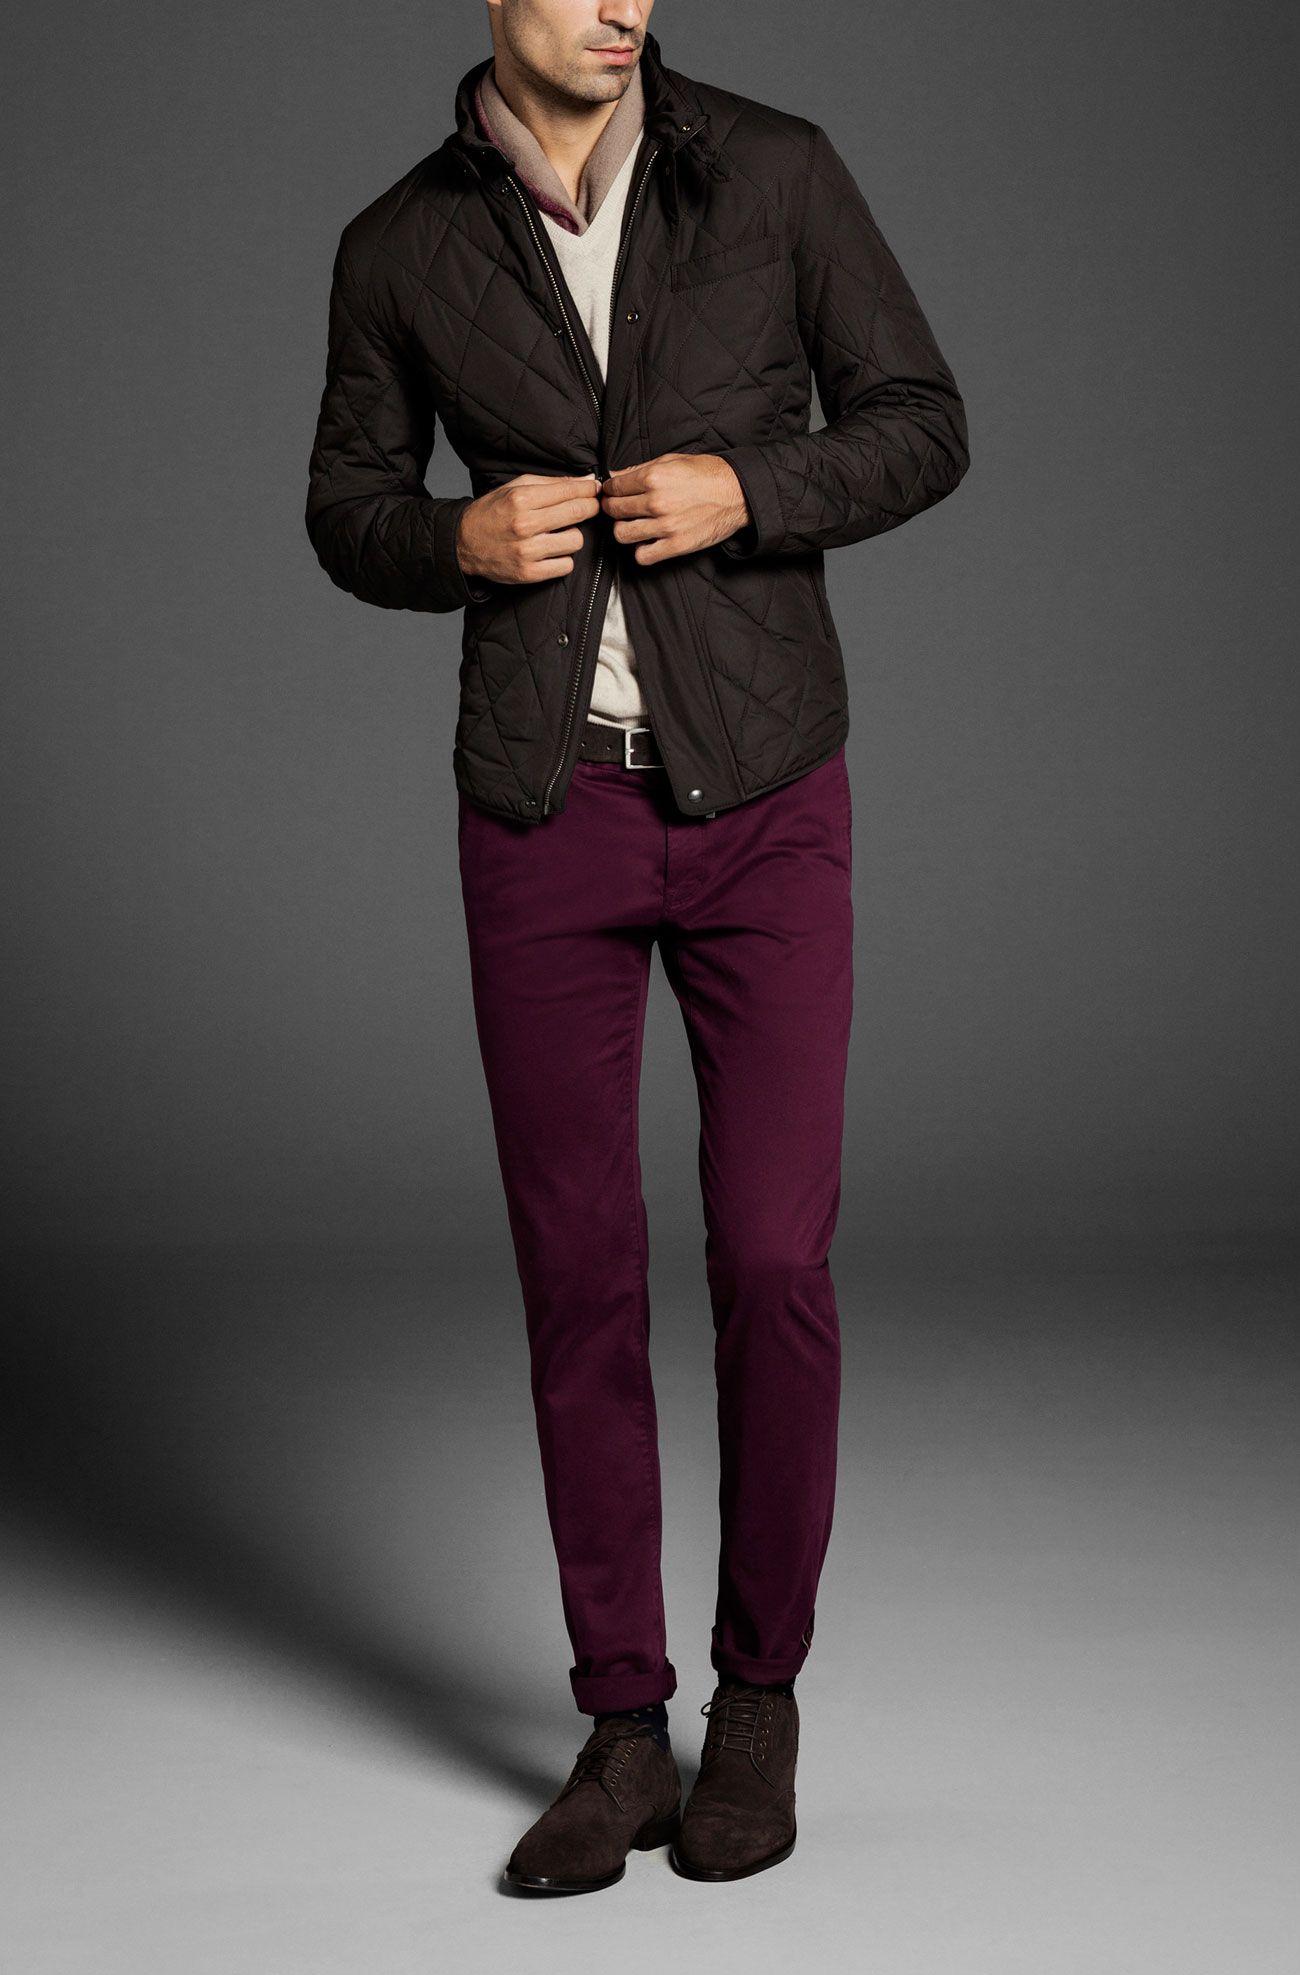 Burgundy Jeans Mens Colored Pants Burgundy Jeans Mens